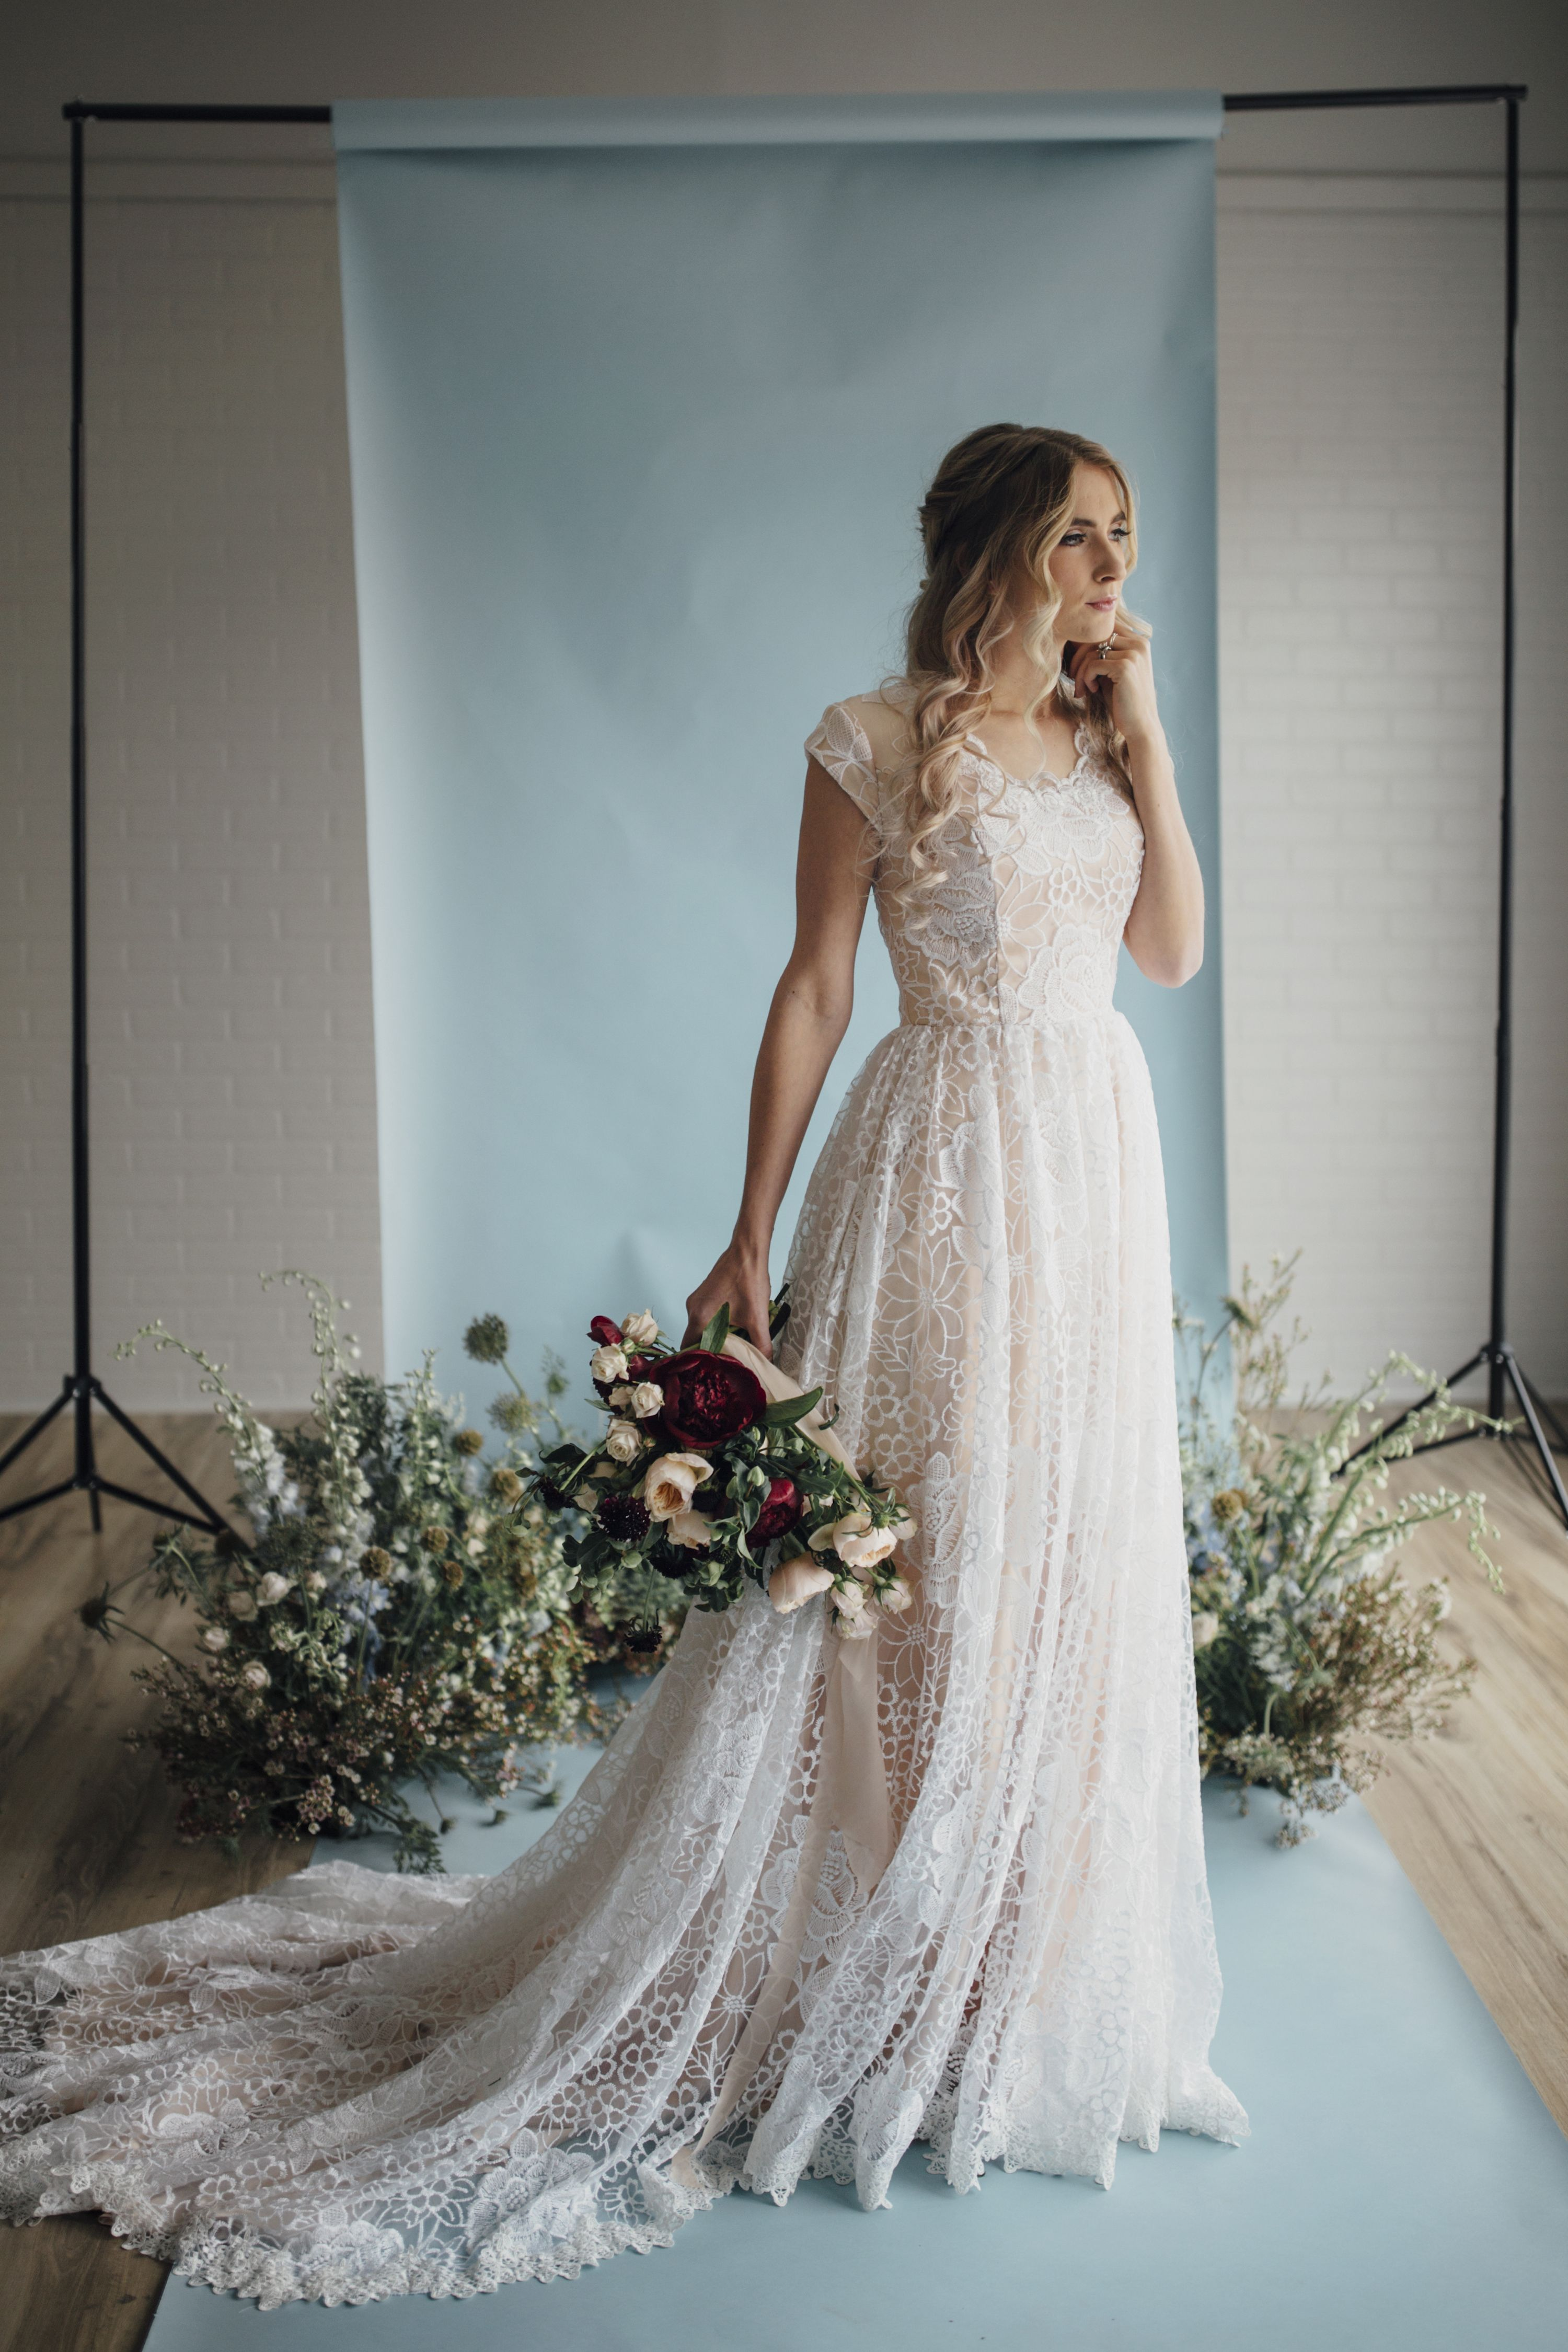 Blush wedding dress with sleeves  Hazel gown by Elizabeth Cooper Design  Photo by Cassandra Farley